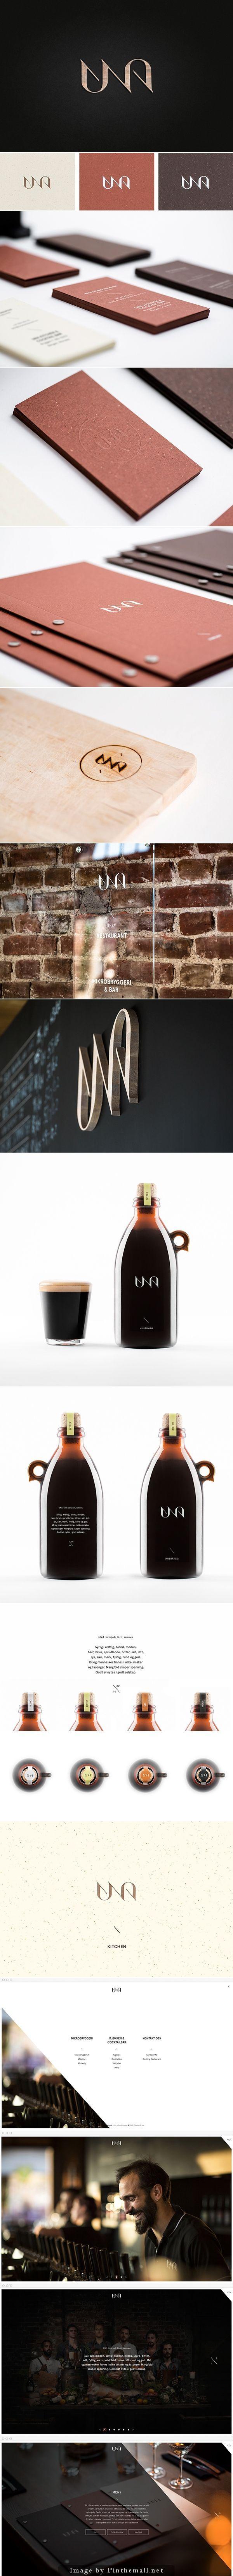 UNA brand design implementation - elegance, using earthy colors.: